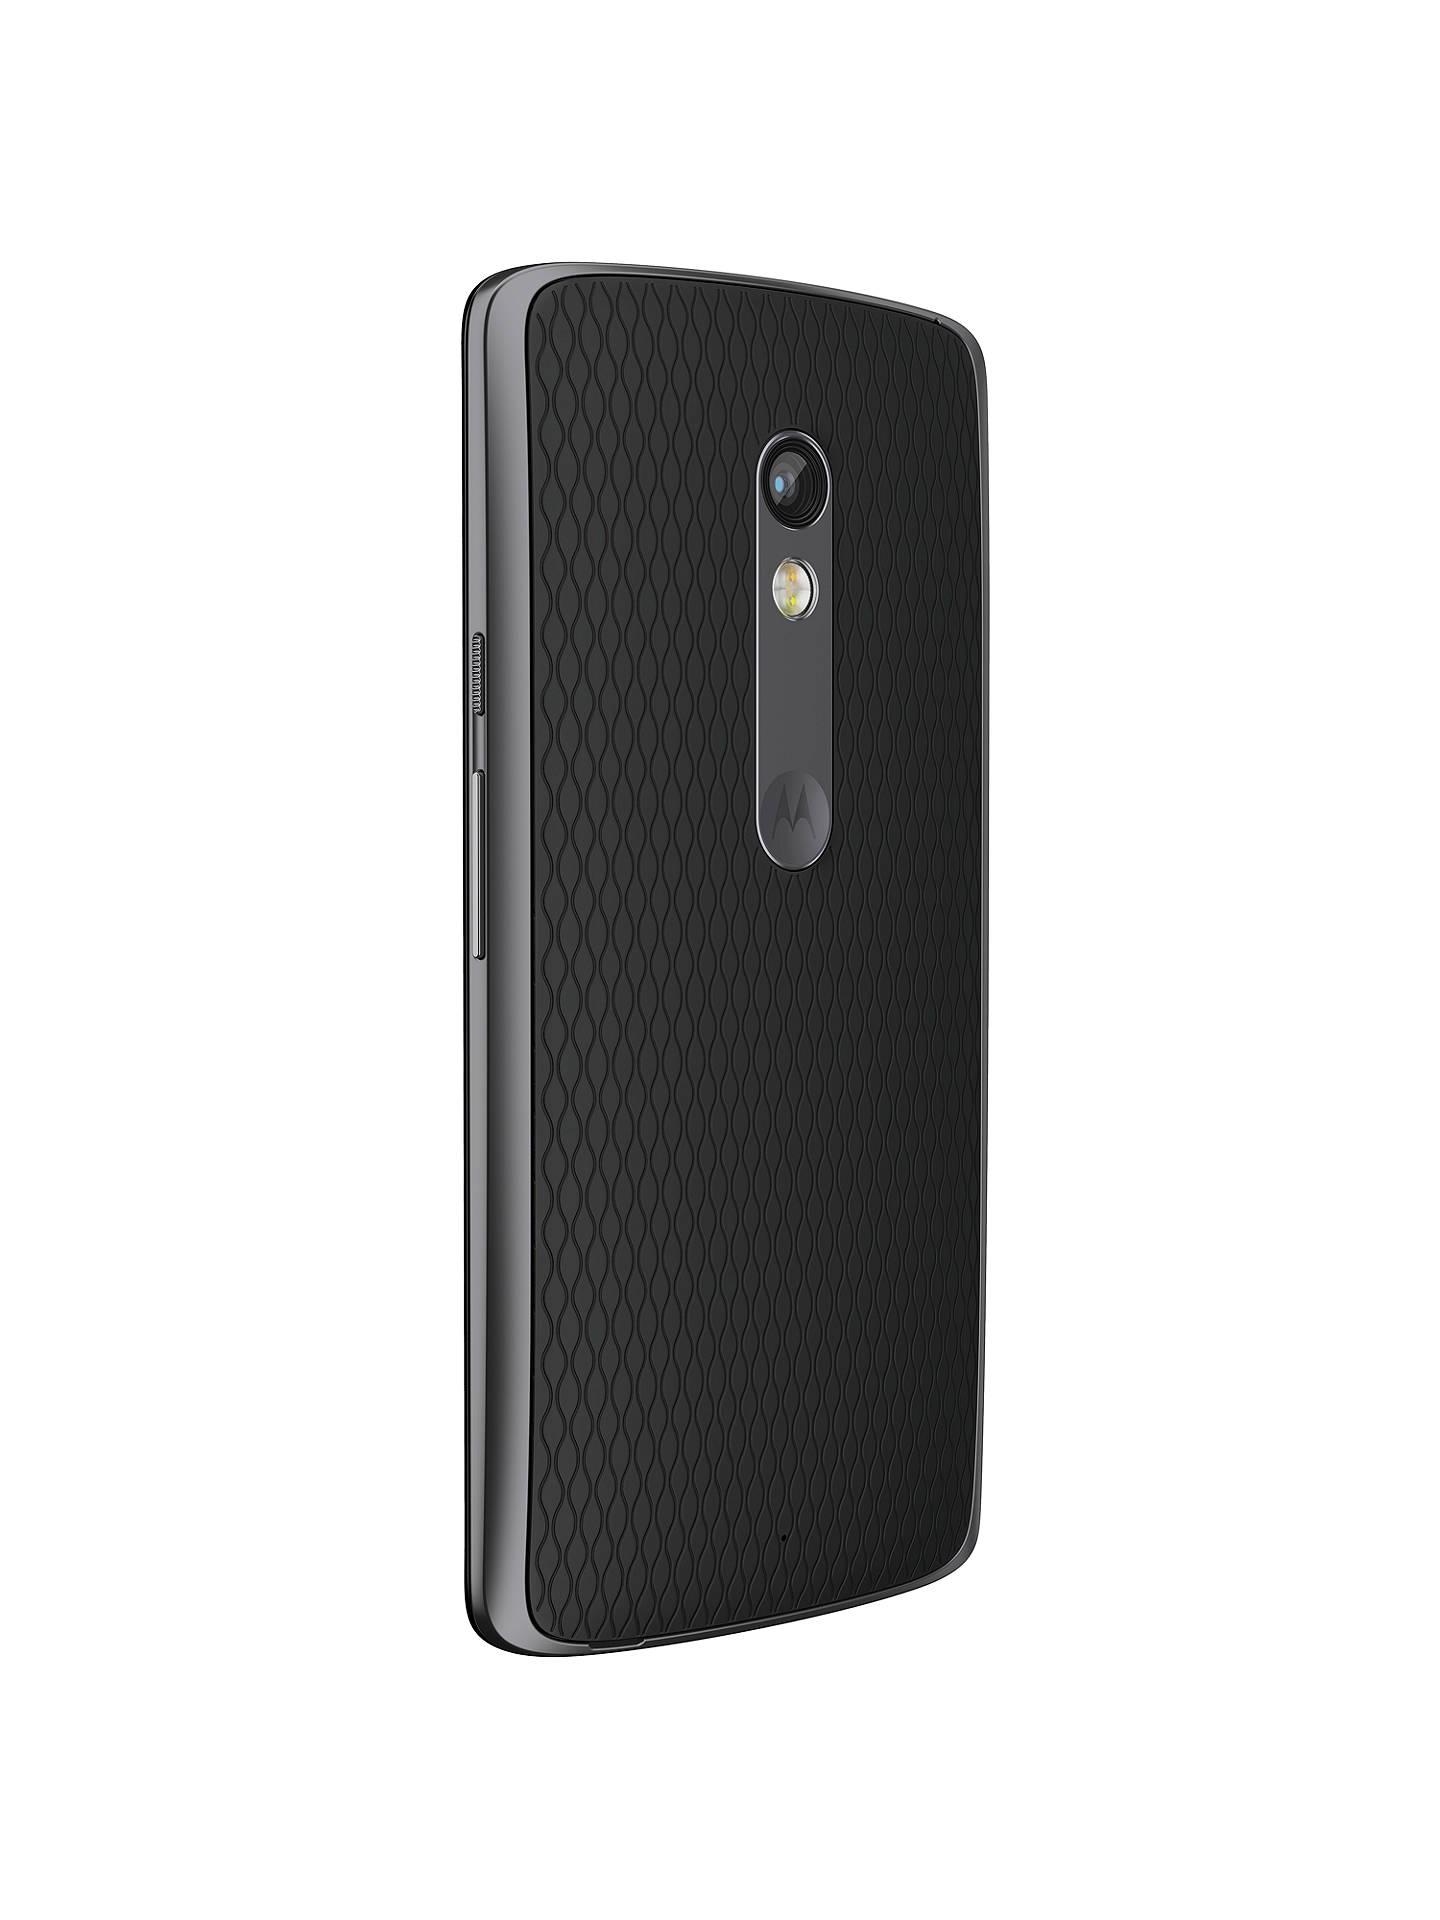 Motorola Moto X Play Smartphone, Android, 5 5